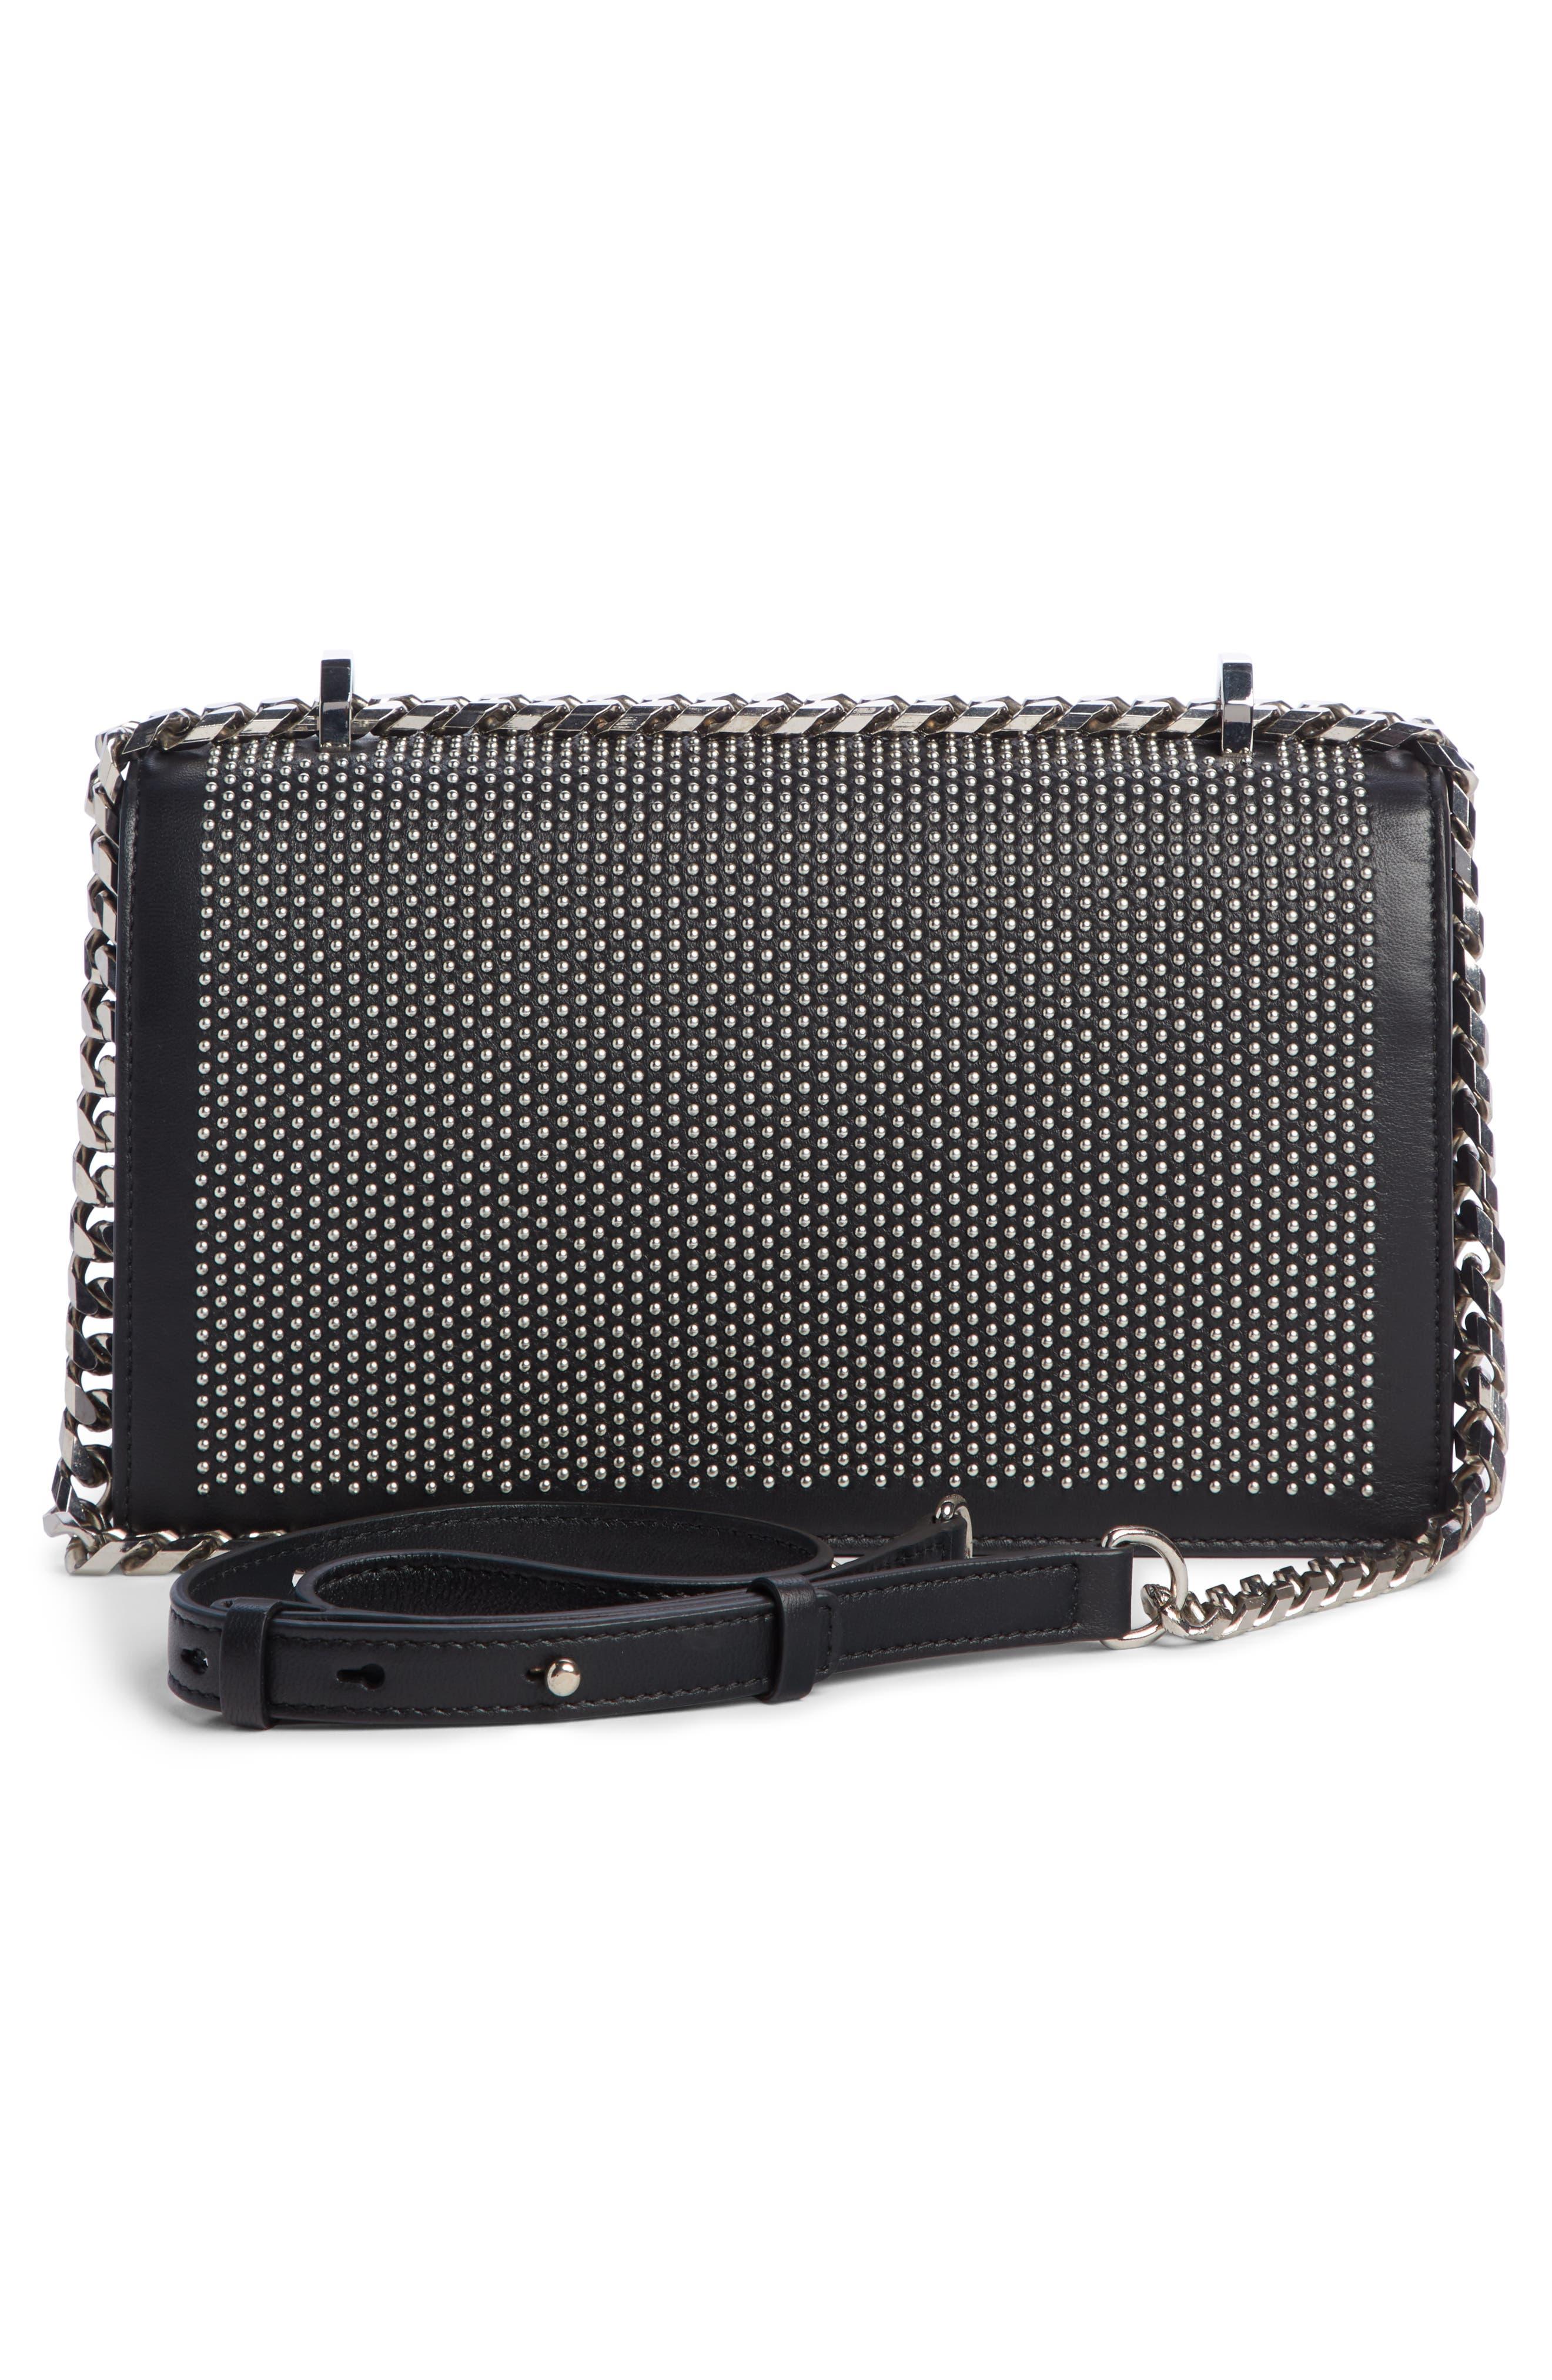 ALEXANDER MCQUEEN,                             Studded Leather Crossbody Knuckle Bag,                             Alternate thumbnail 3, color,                             BLACK